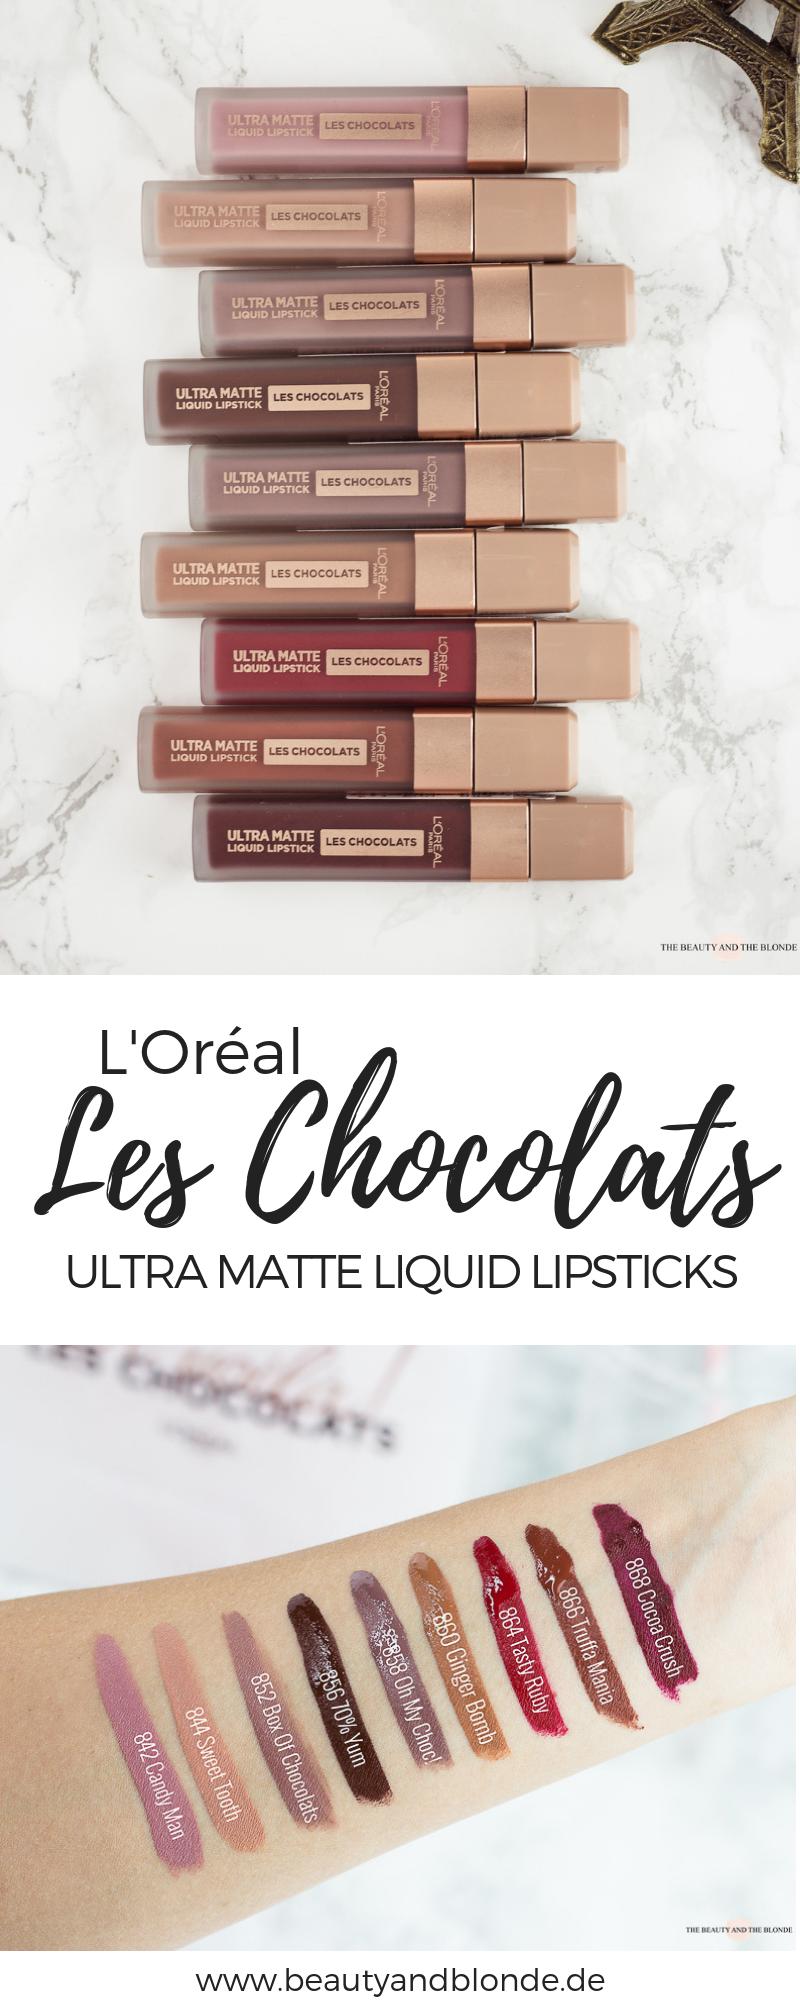 Ganz Neu In Der Drogerie Sind Die Loréal Les Chocolats Ultra Matte